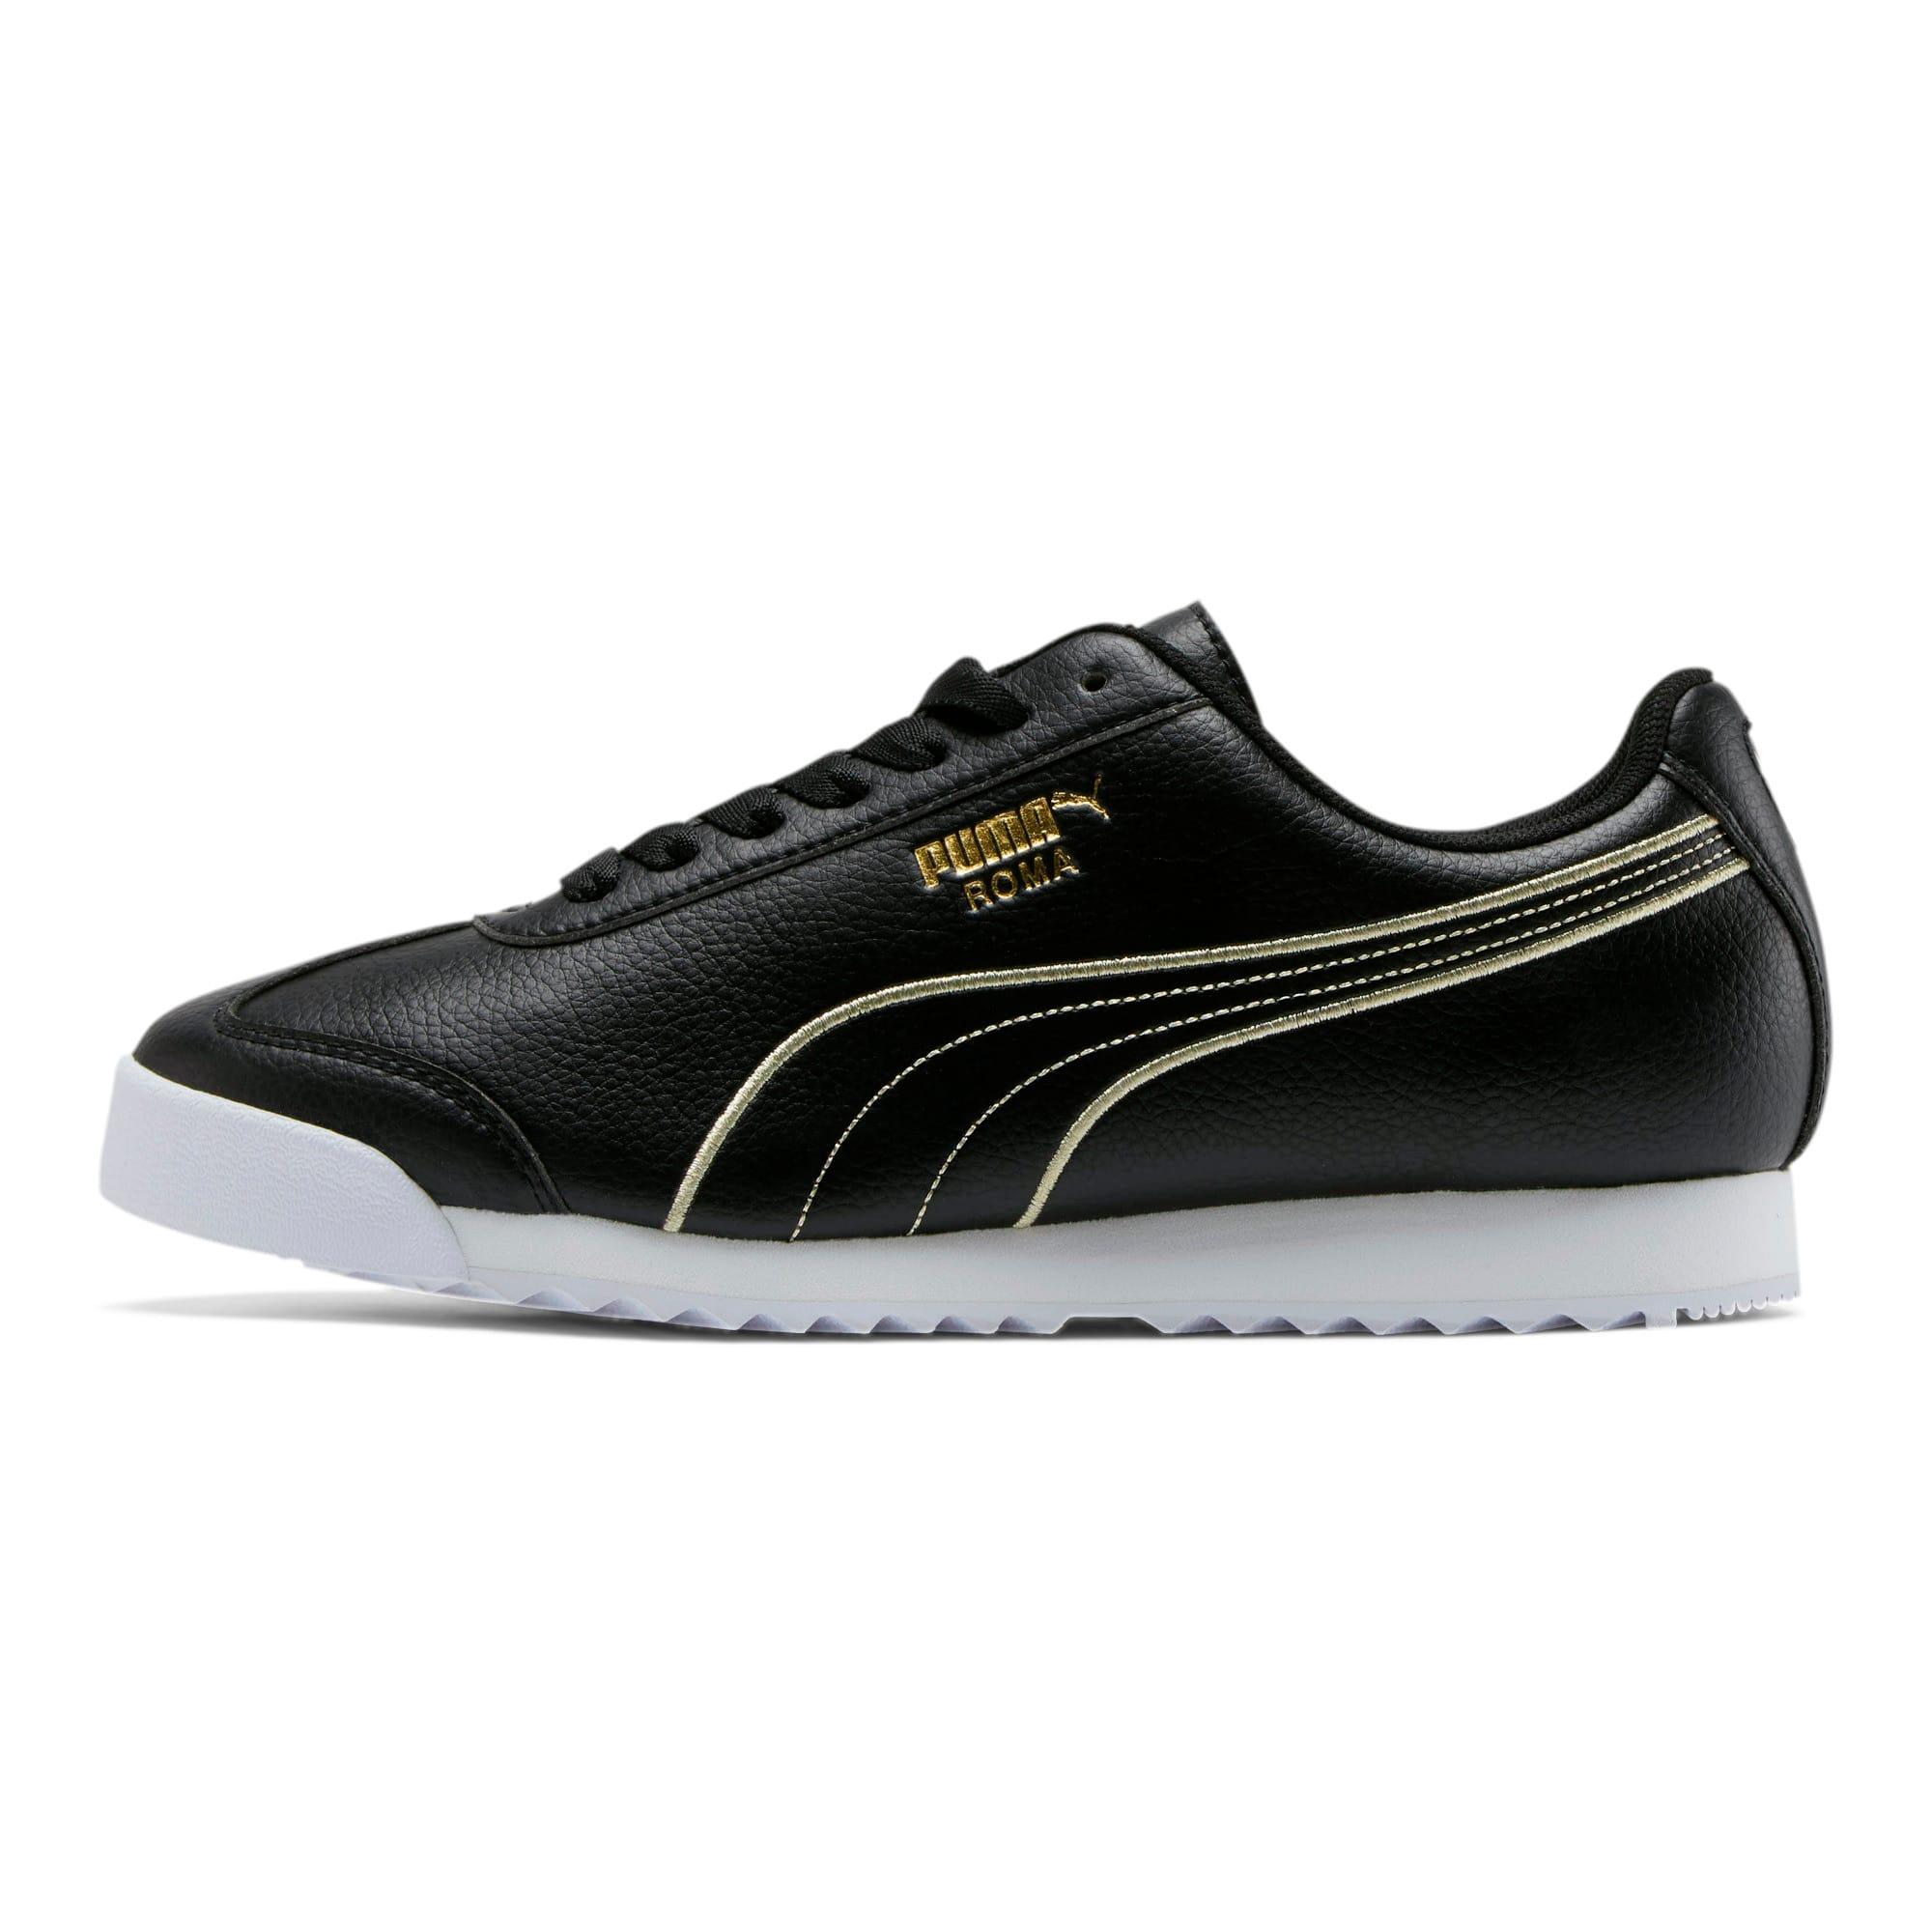 Thumbnail 1 of Roma Metallic Stitch Women's Sneakers, Puma Black-Puma Team Gold, medium